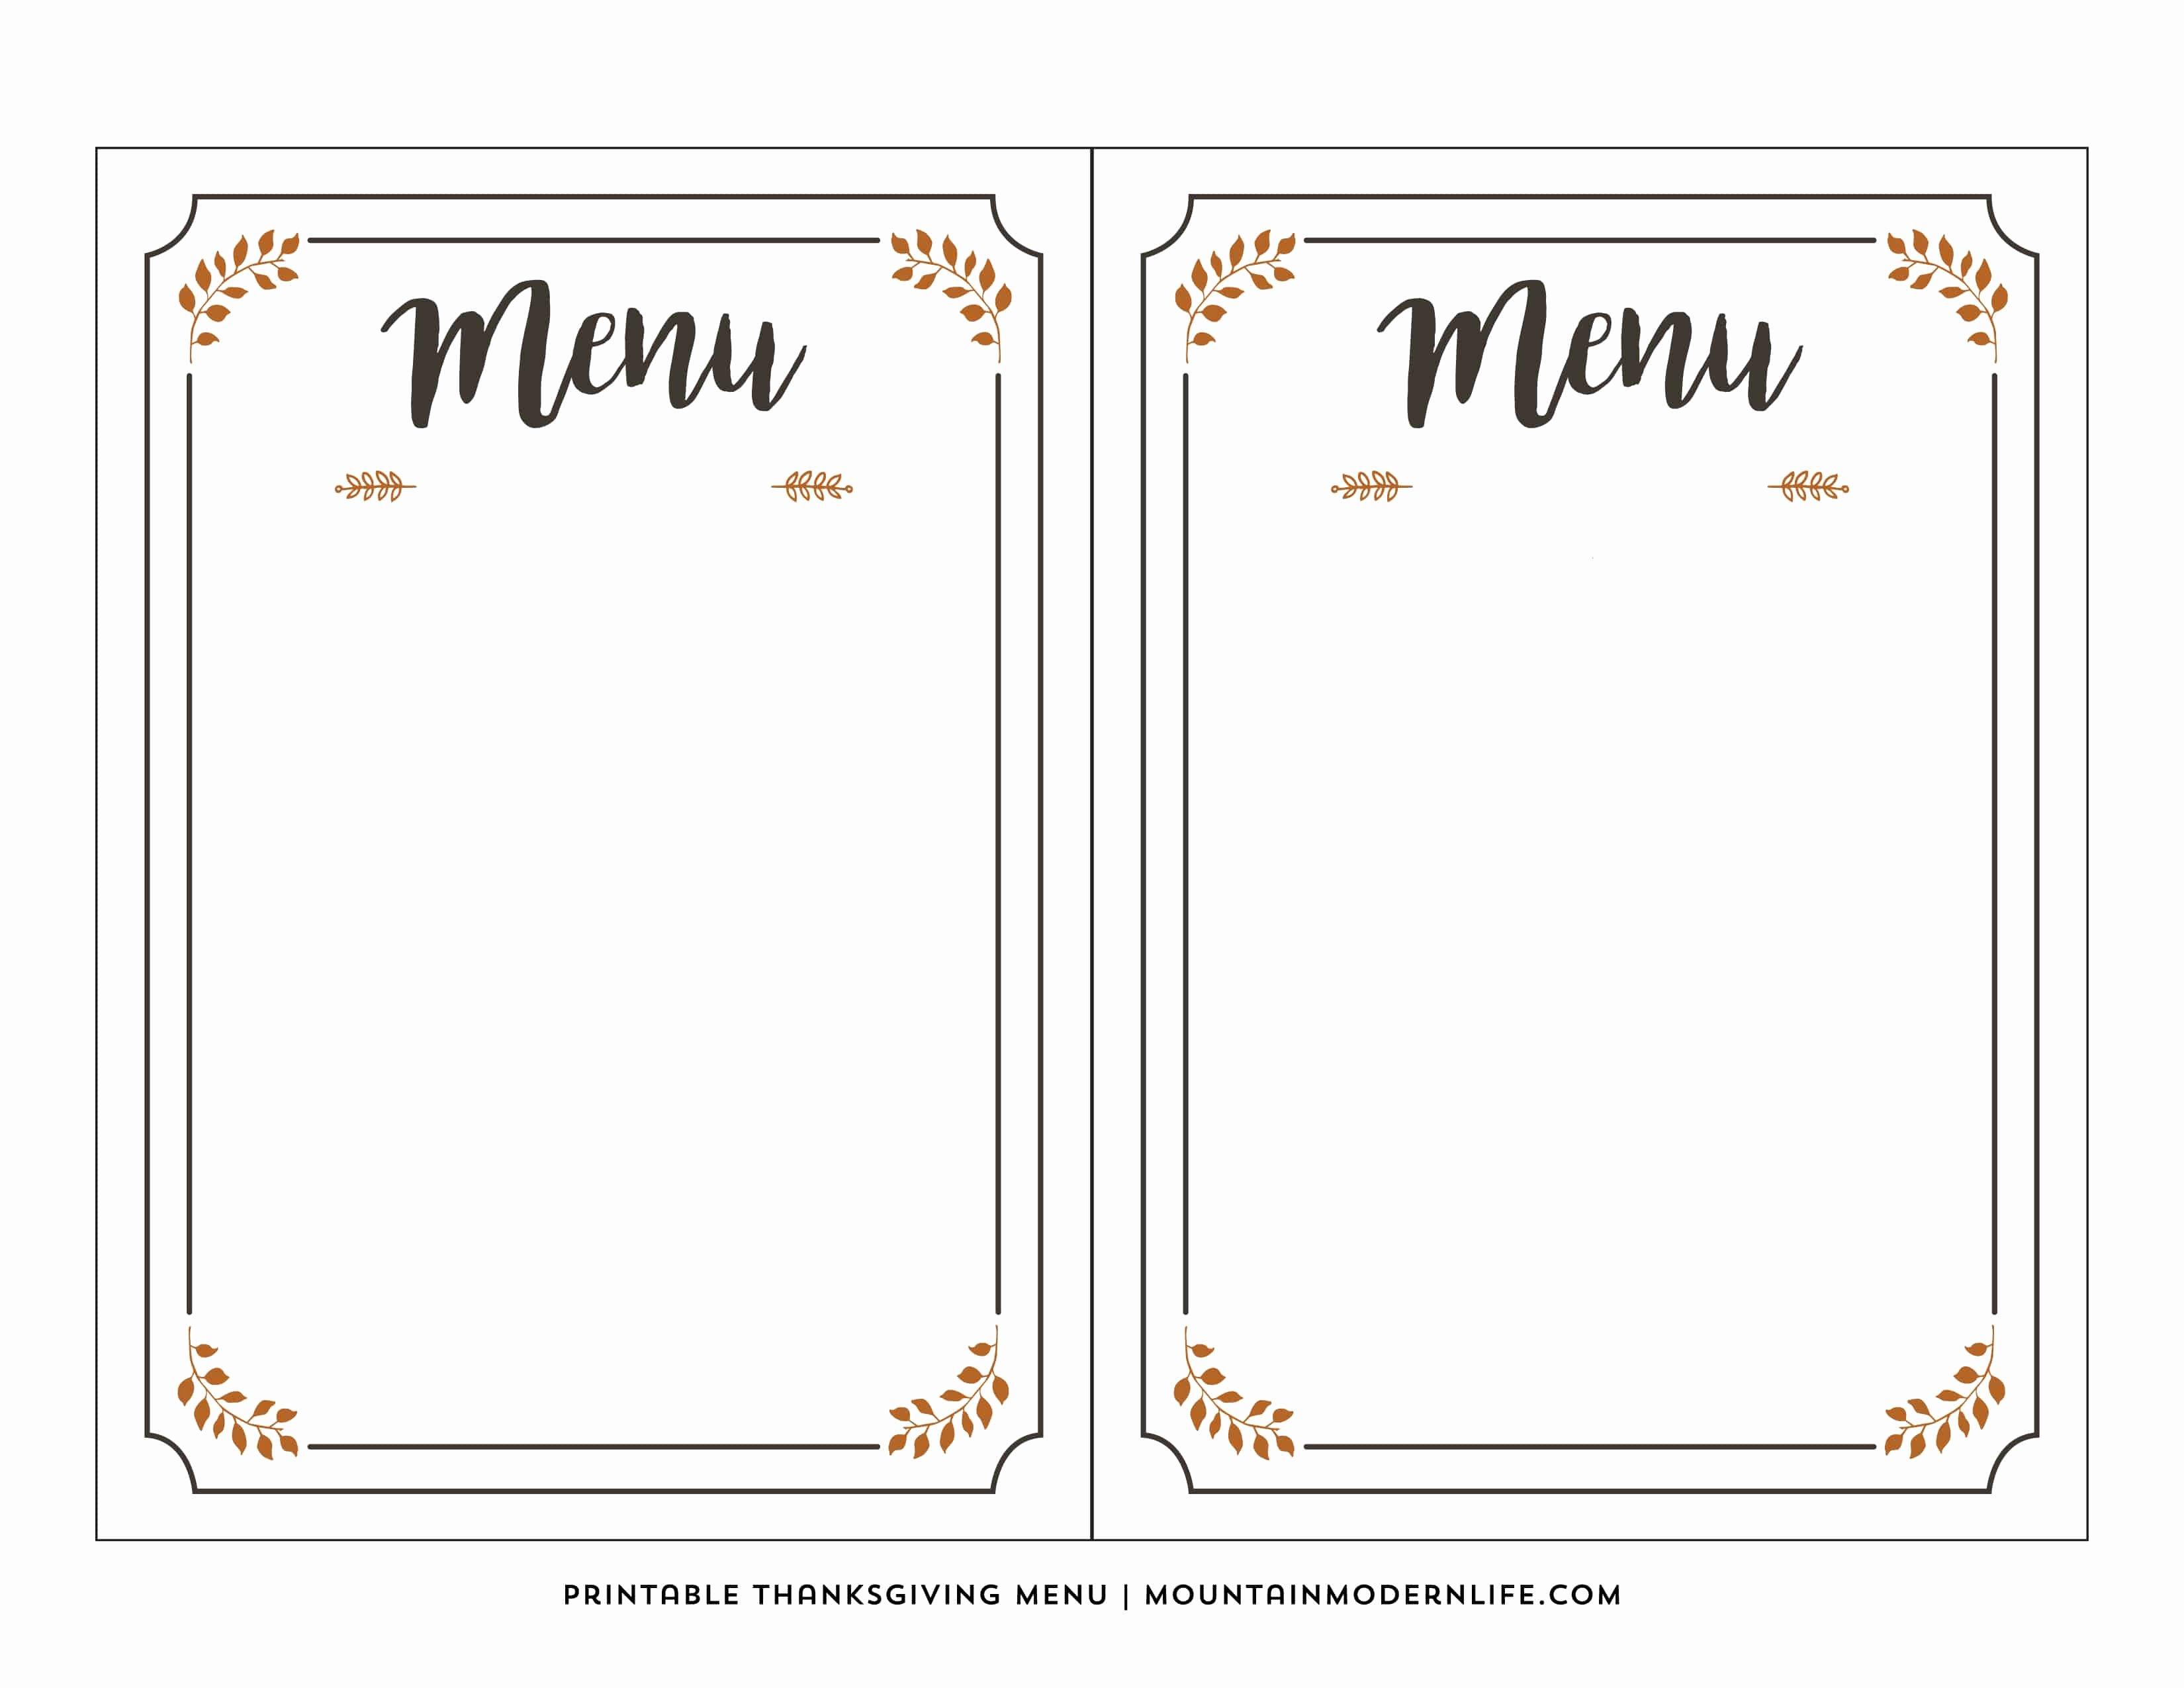 Blank Restaurant Menu Template Luxury Free Printable Thanksgiving Menu